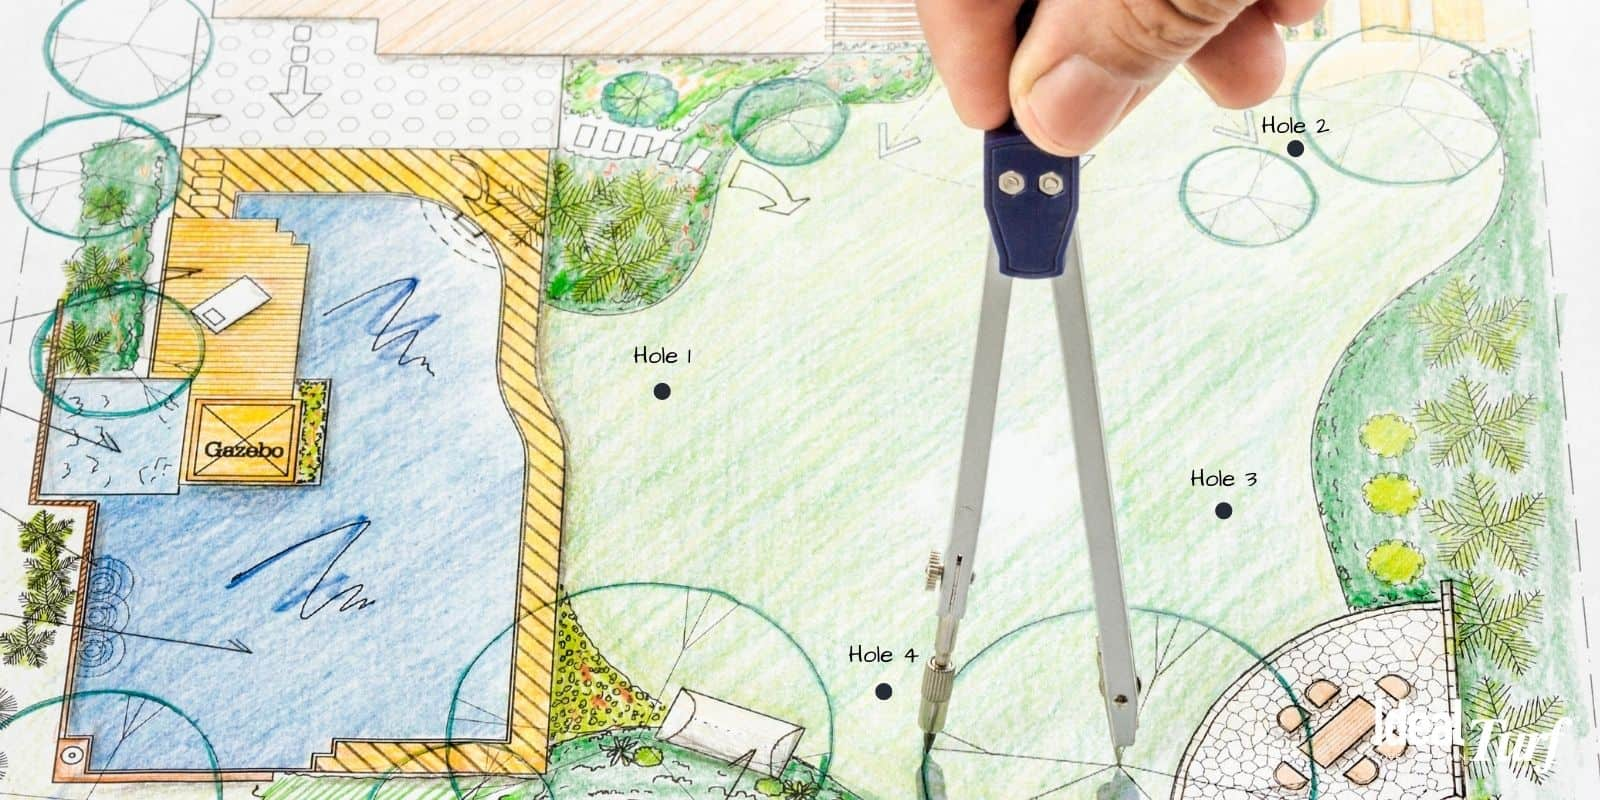 1. Putting Green Design Mockup